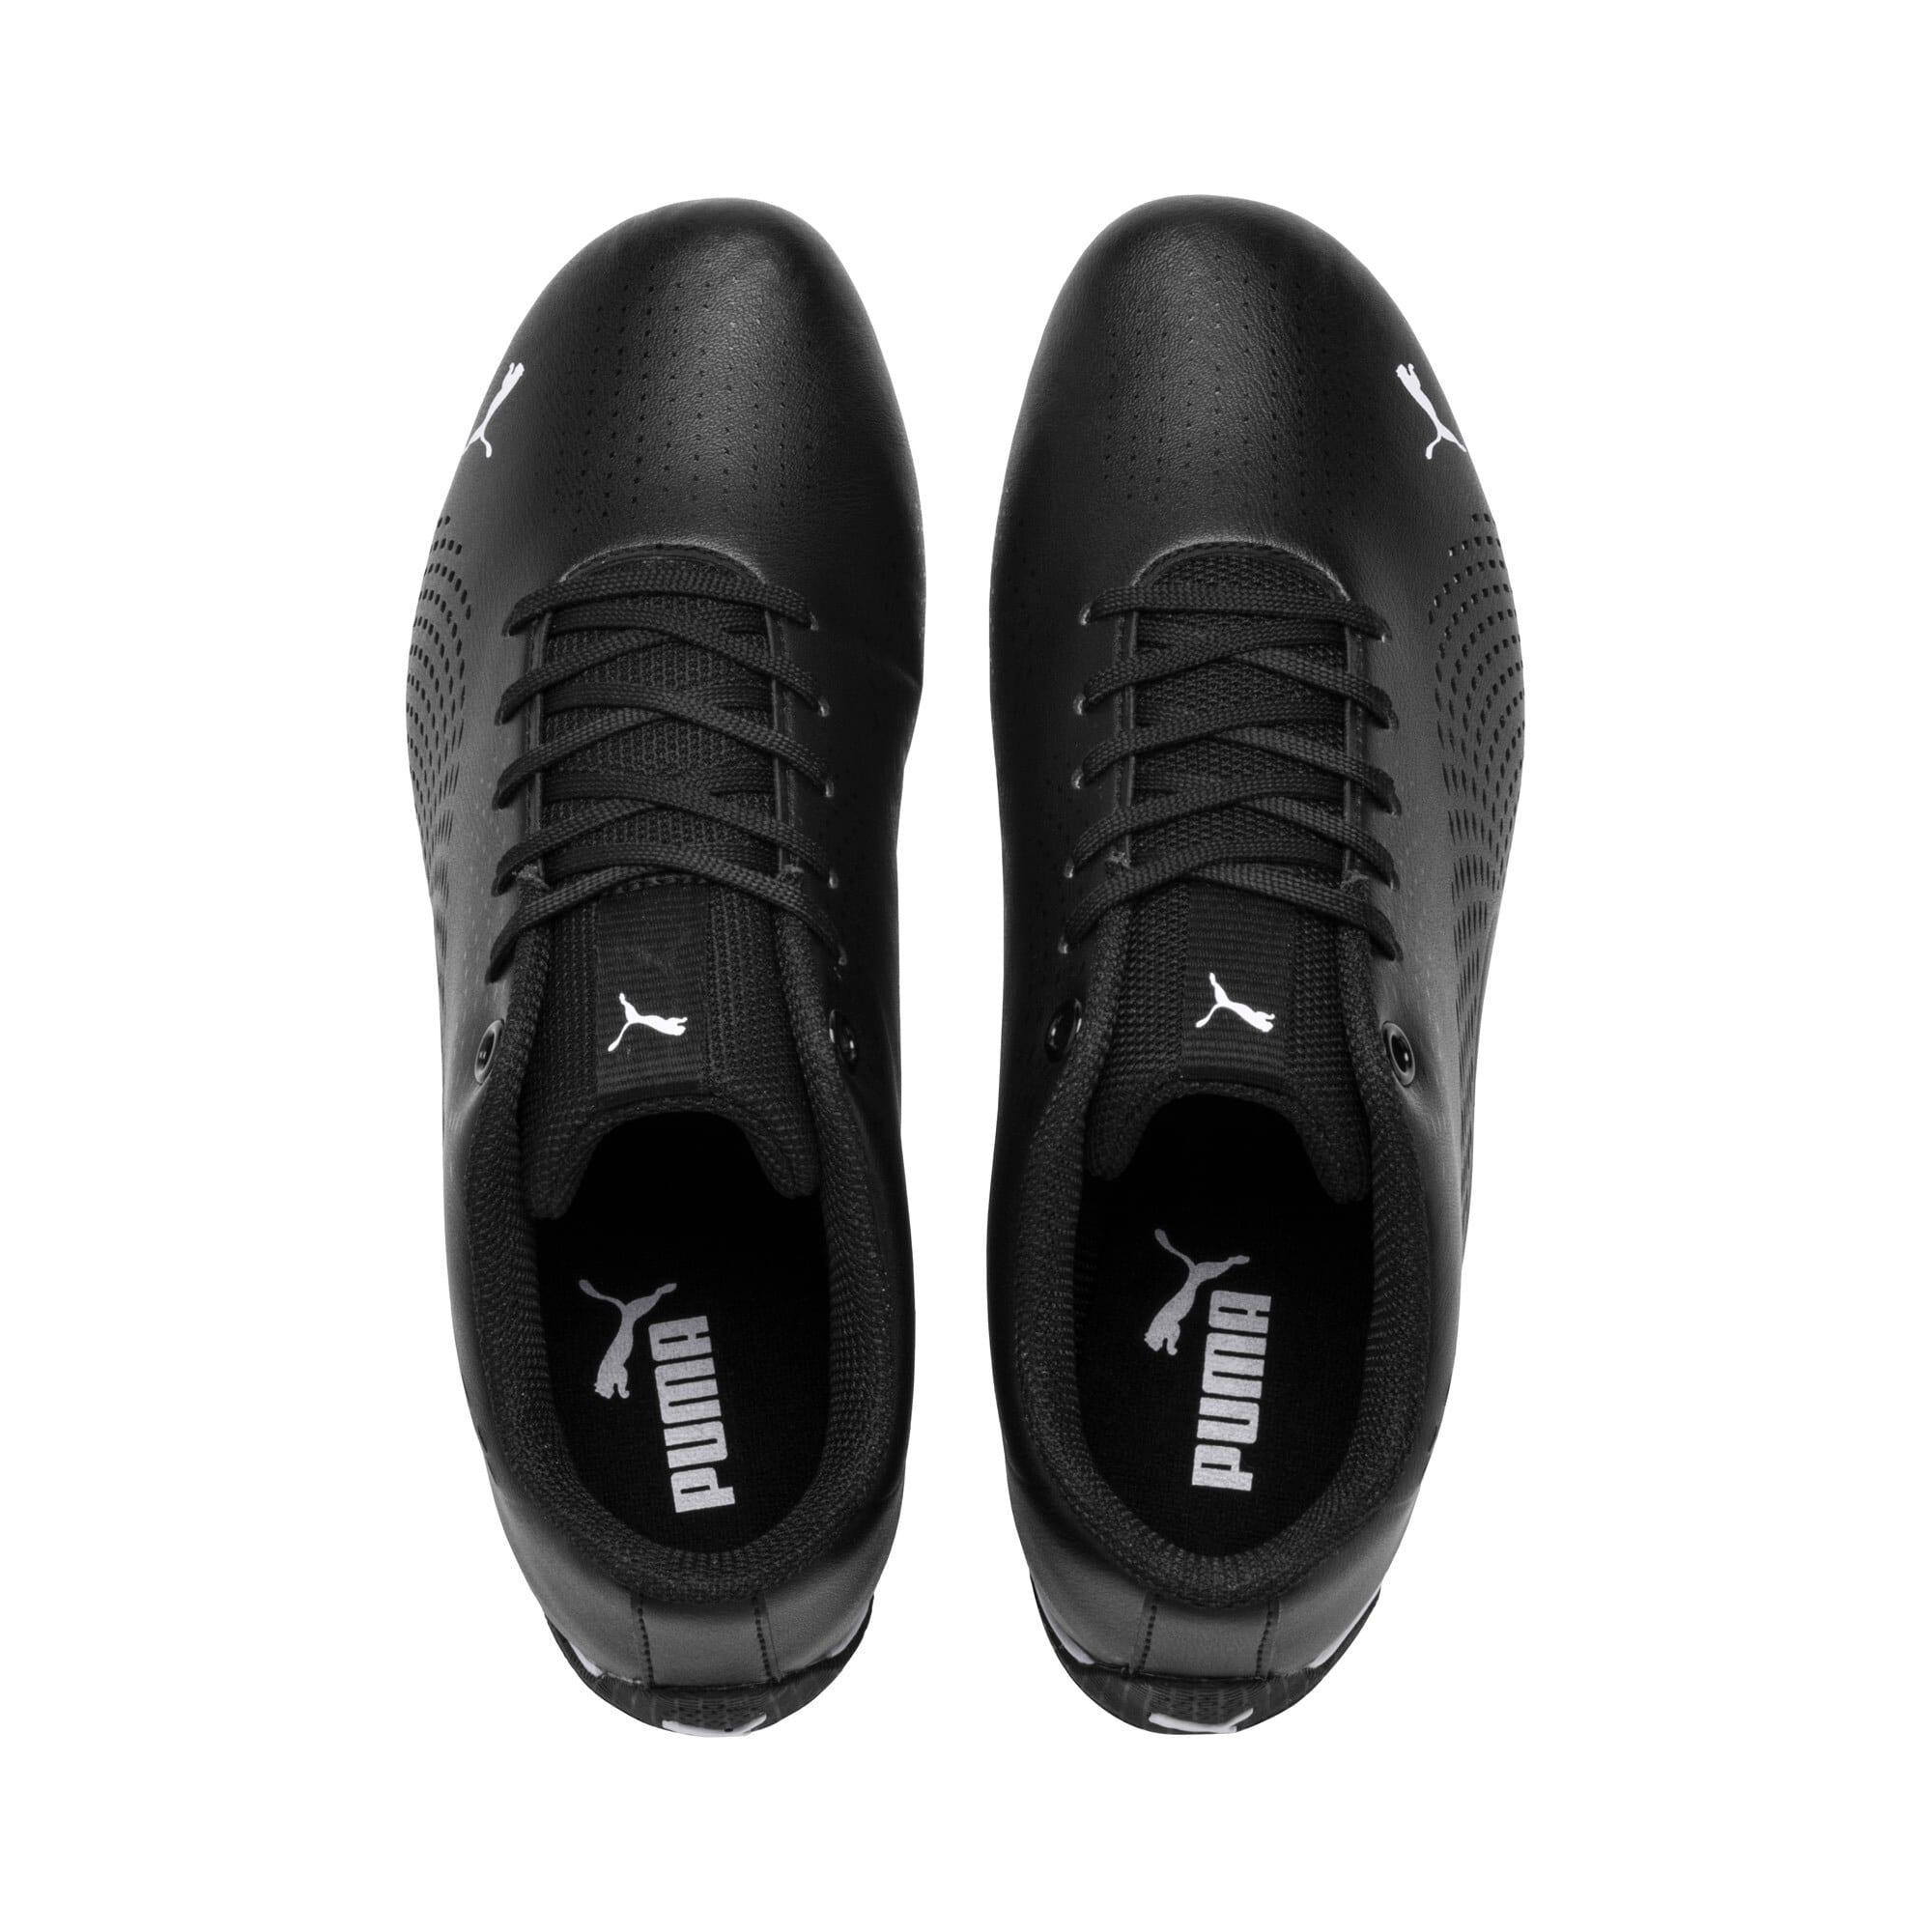 Thumbnail 6 of Ferrari Drift Cat 5 Ultra II Youth Sneaker, Puma Black-Puma White, medium